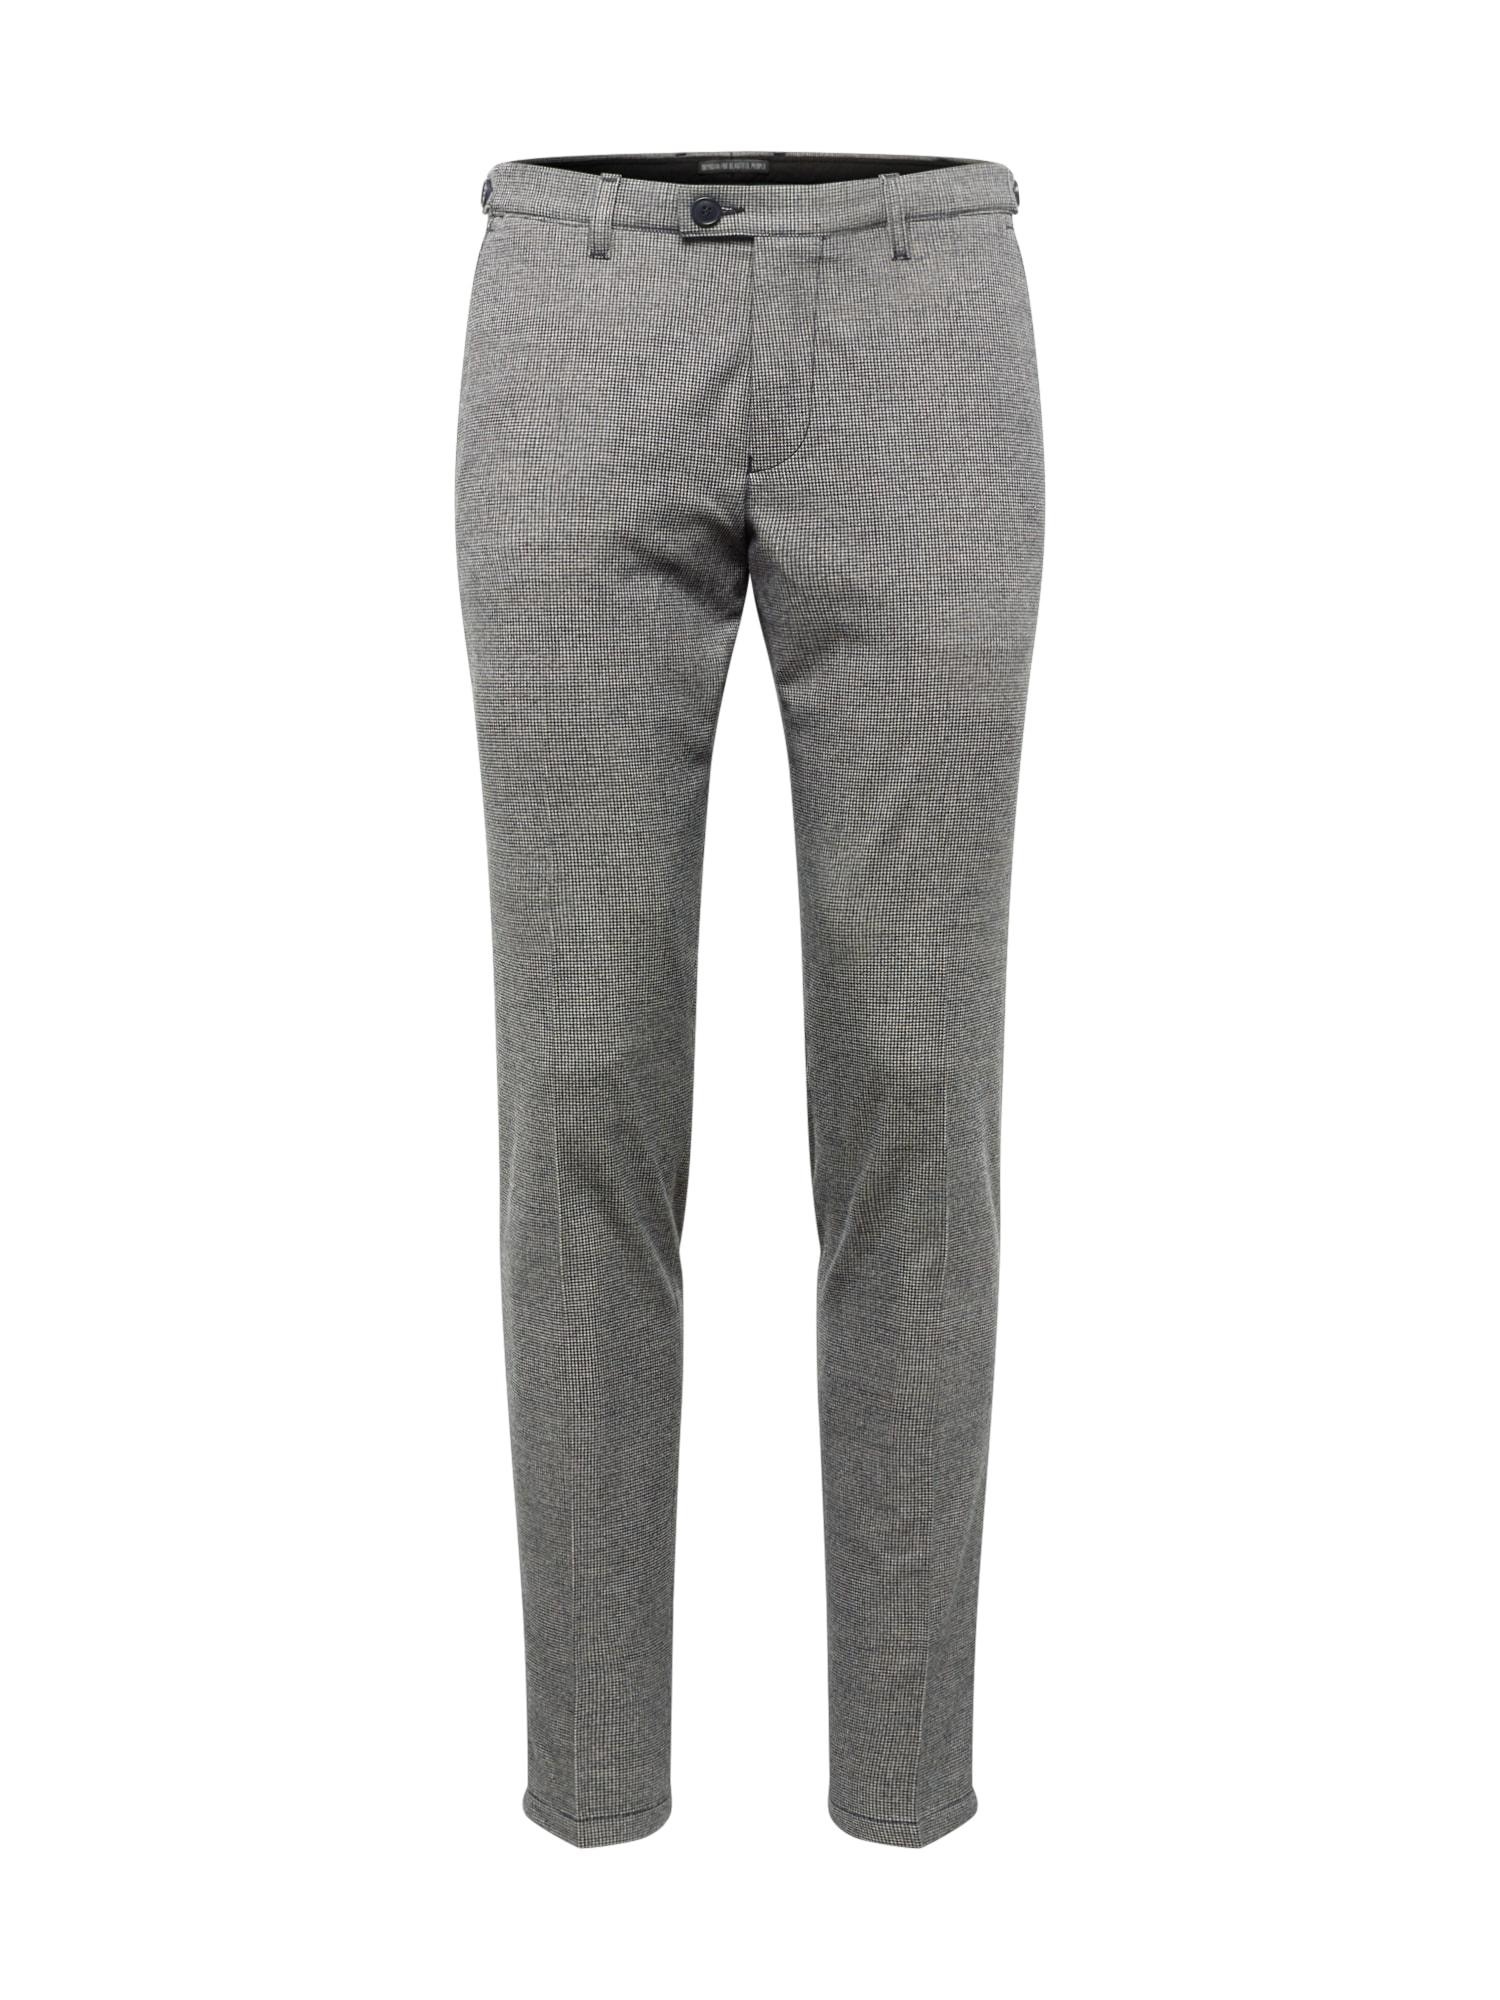 Kalhoty s puky KILL tmavě šedá DRYKORN